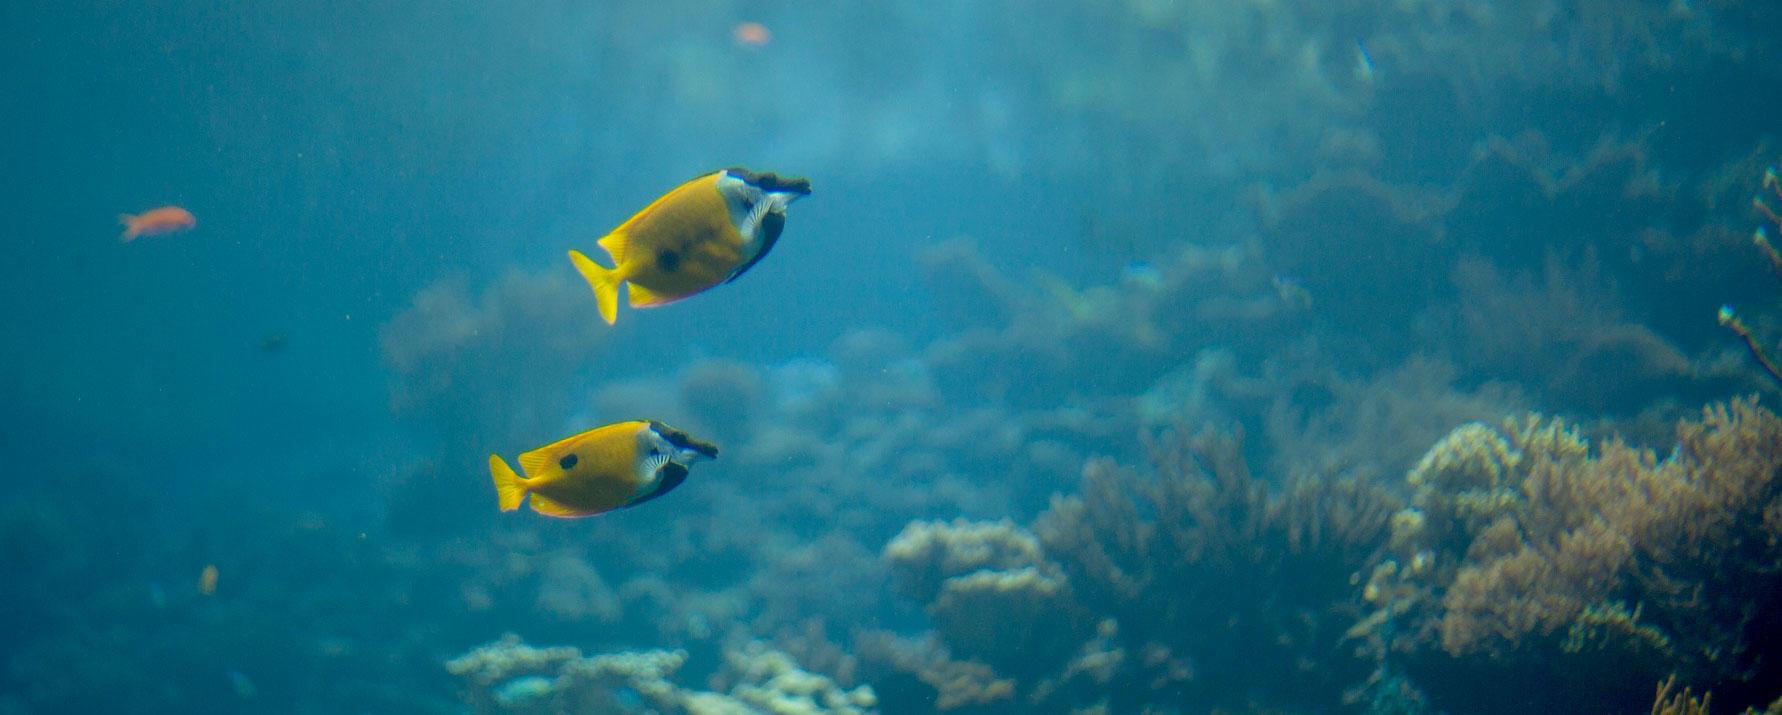 Two rabbitfish swimming